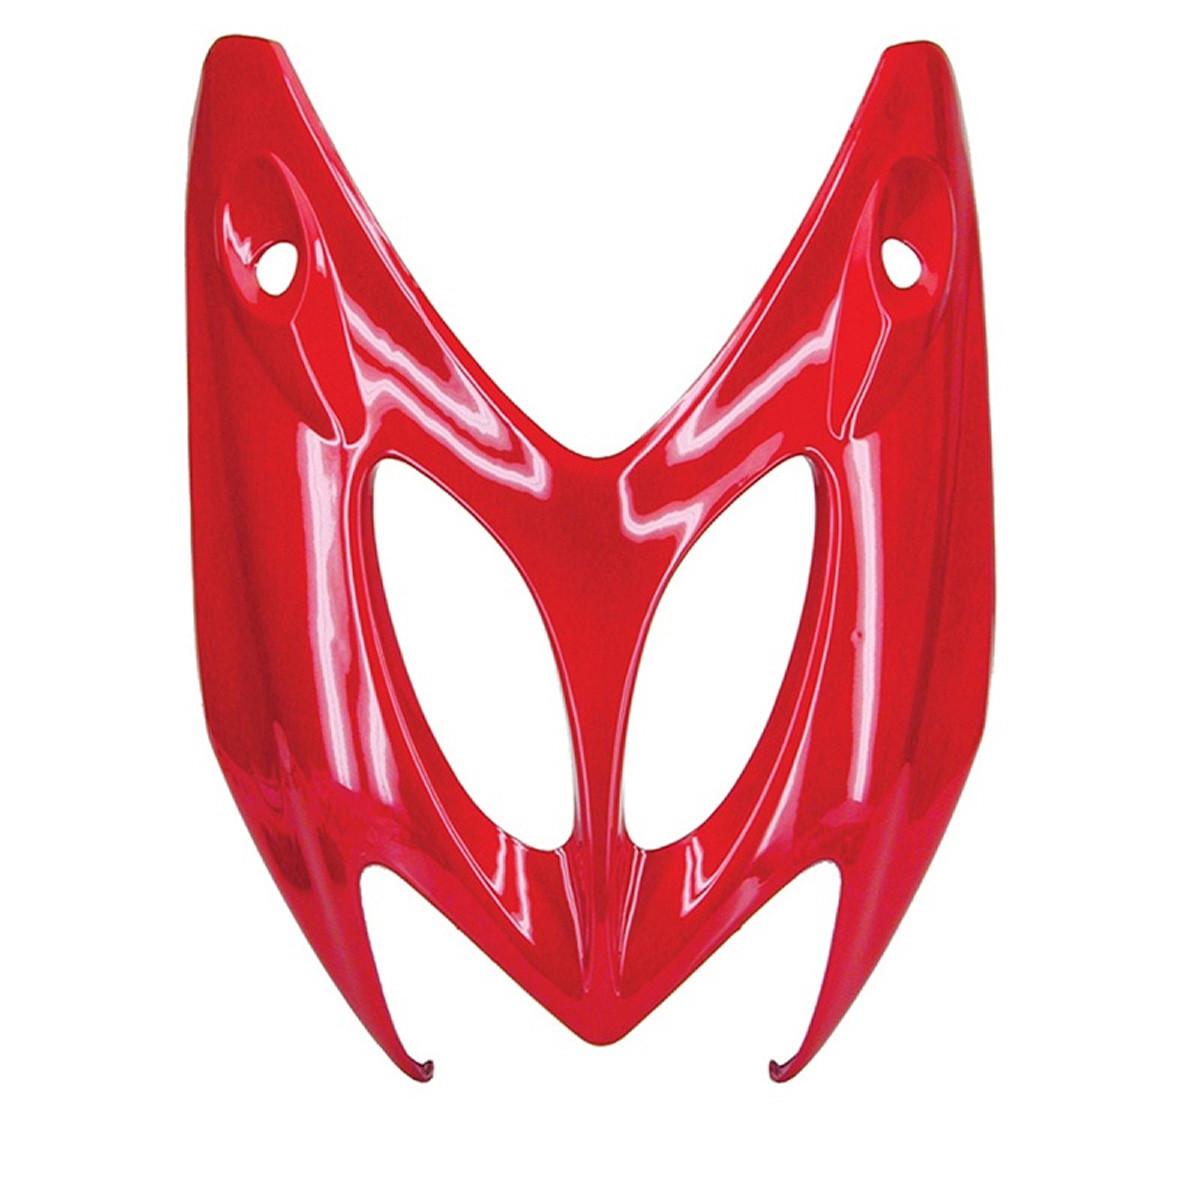 Face avant MBK Nitro, YAMAHA Aerox avant 2013 - TNT Rouge Scuderia